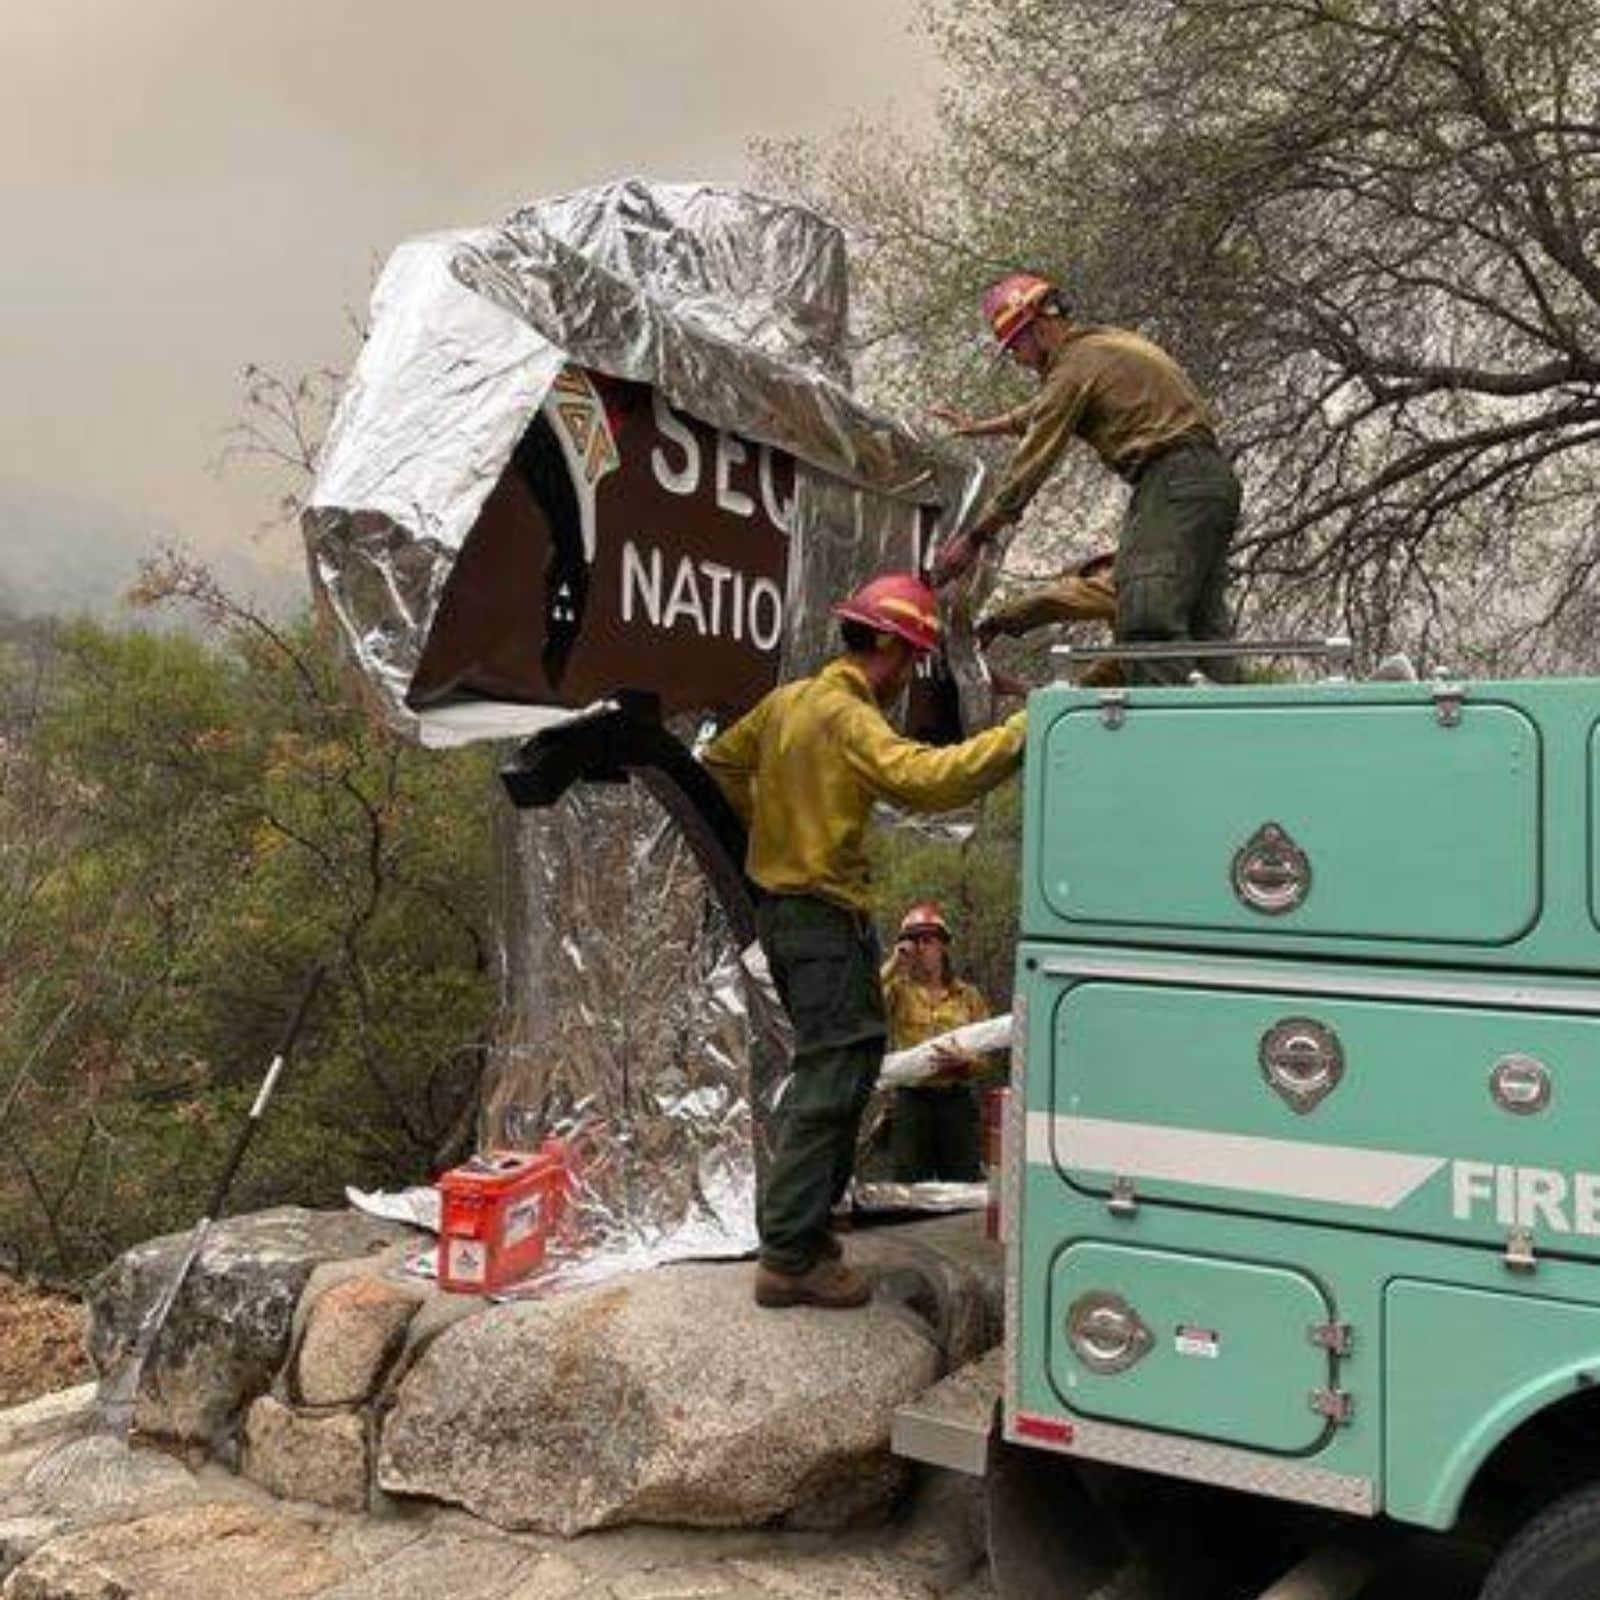 aluminium foil wrapped around world largest tree california